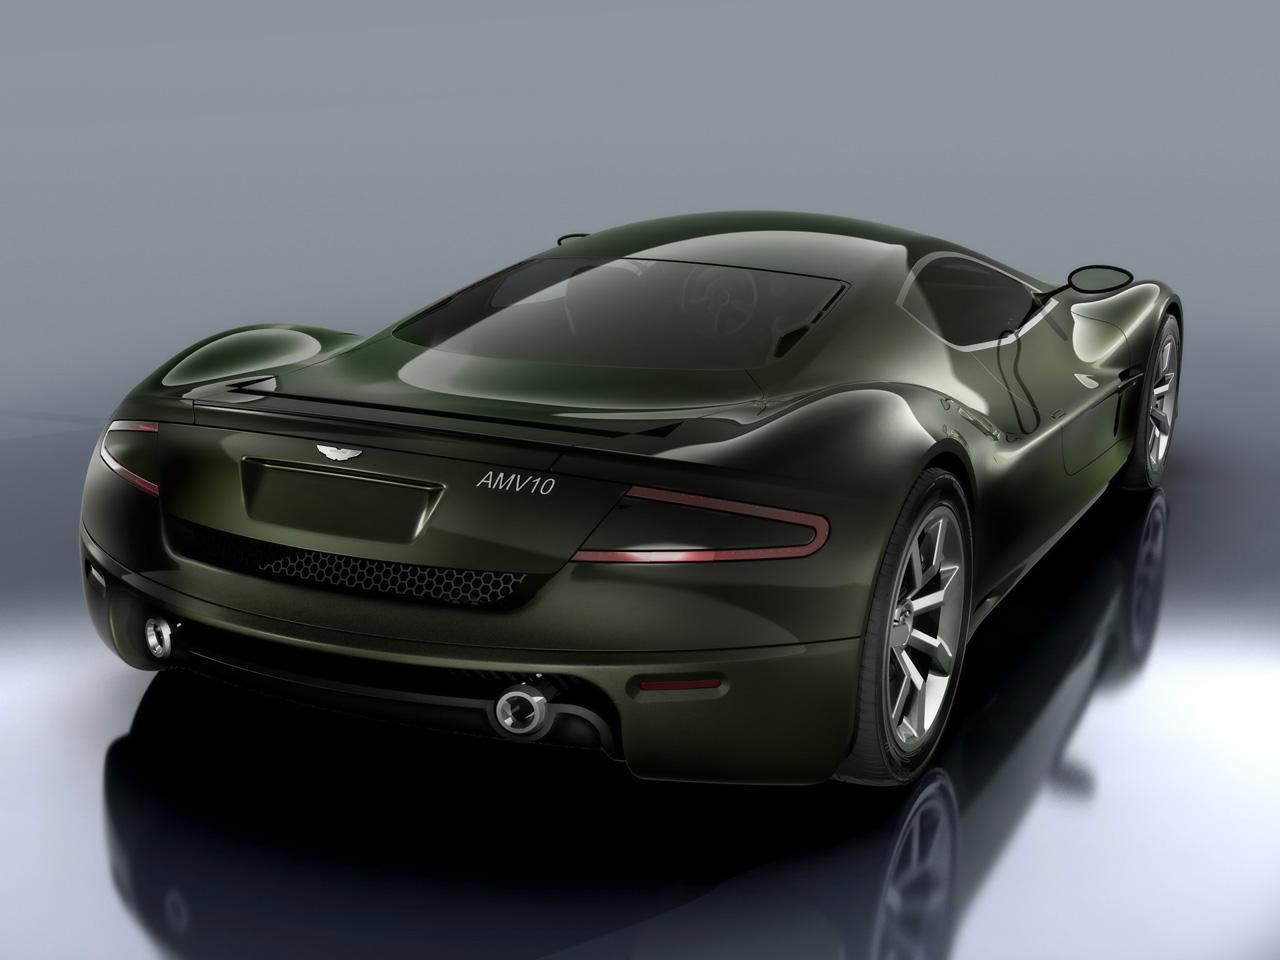 Cars Riccars Design: Aston Martin AMV10 Best Car Wallpapers